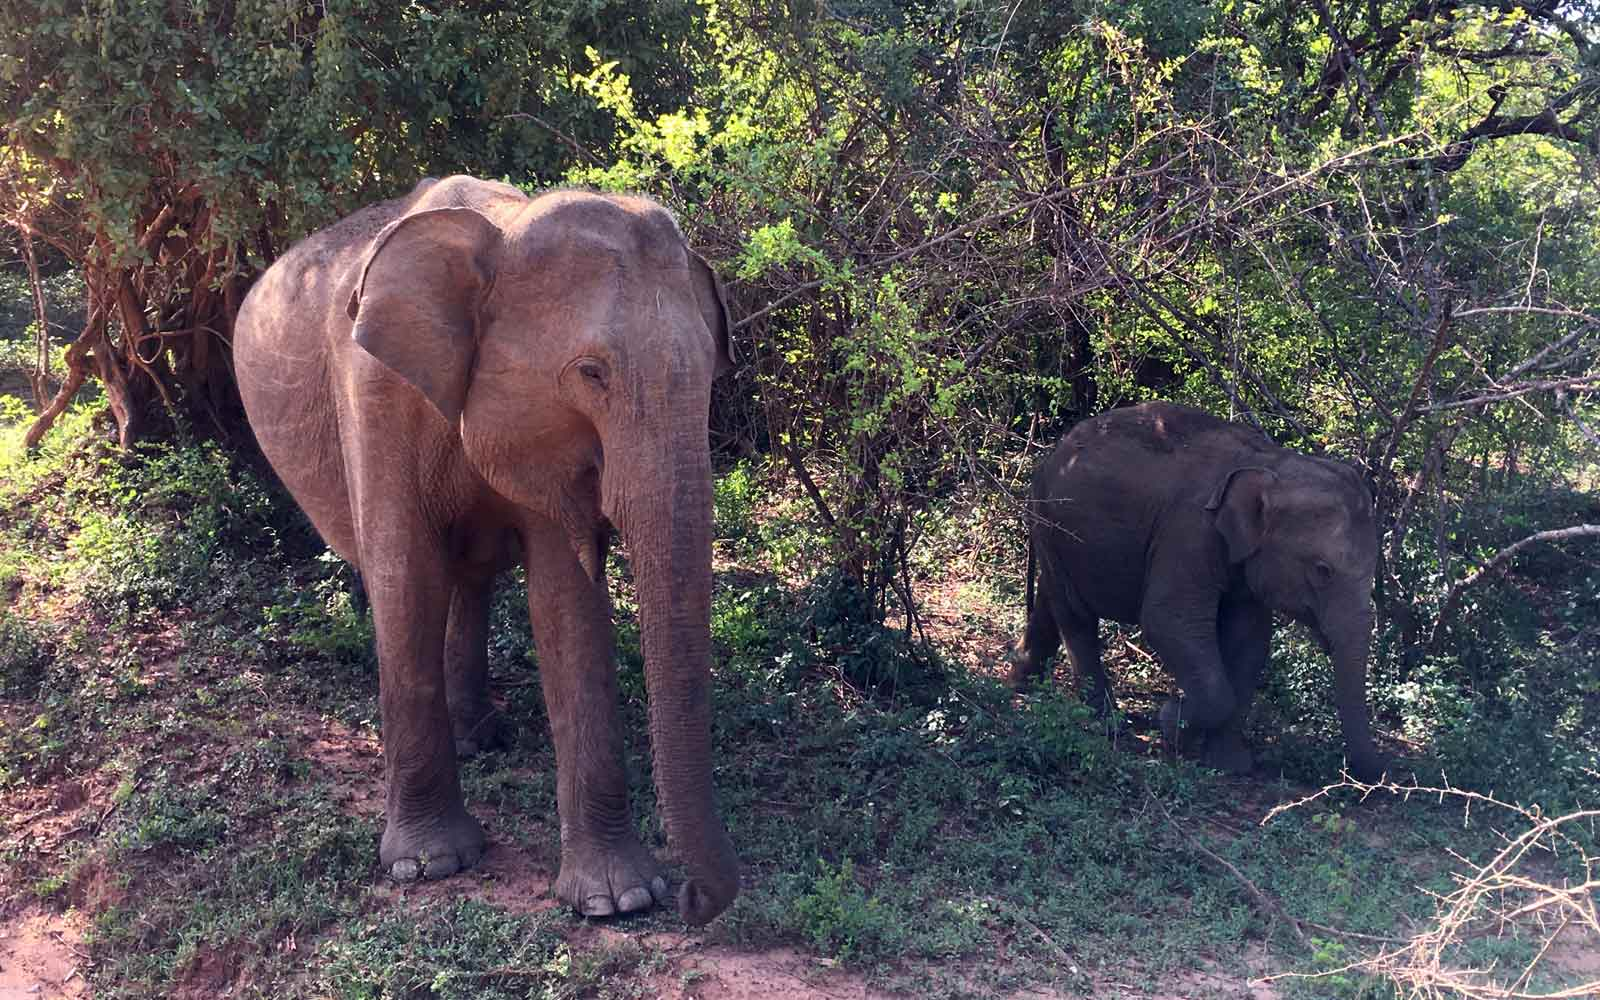 Elefanten im Yala-Nationalpark in Sri Lanka